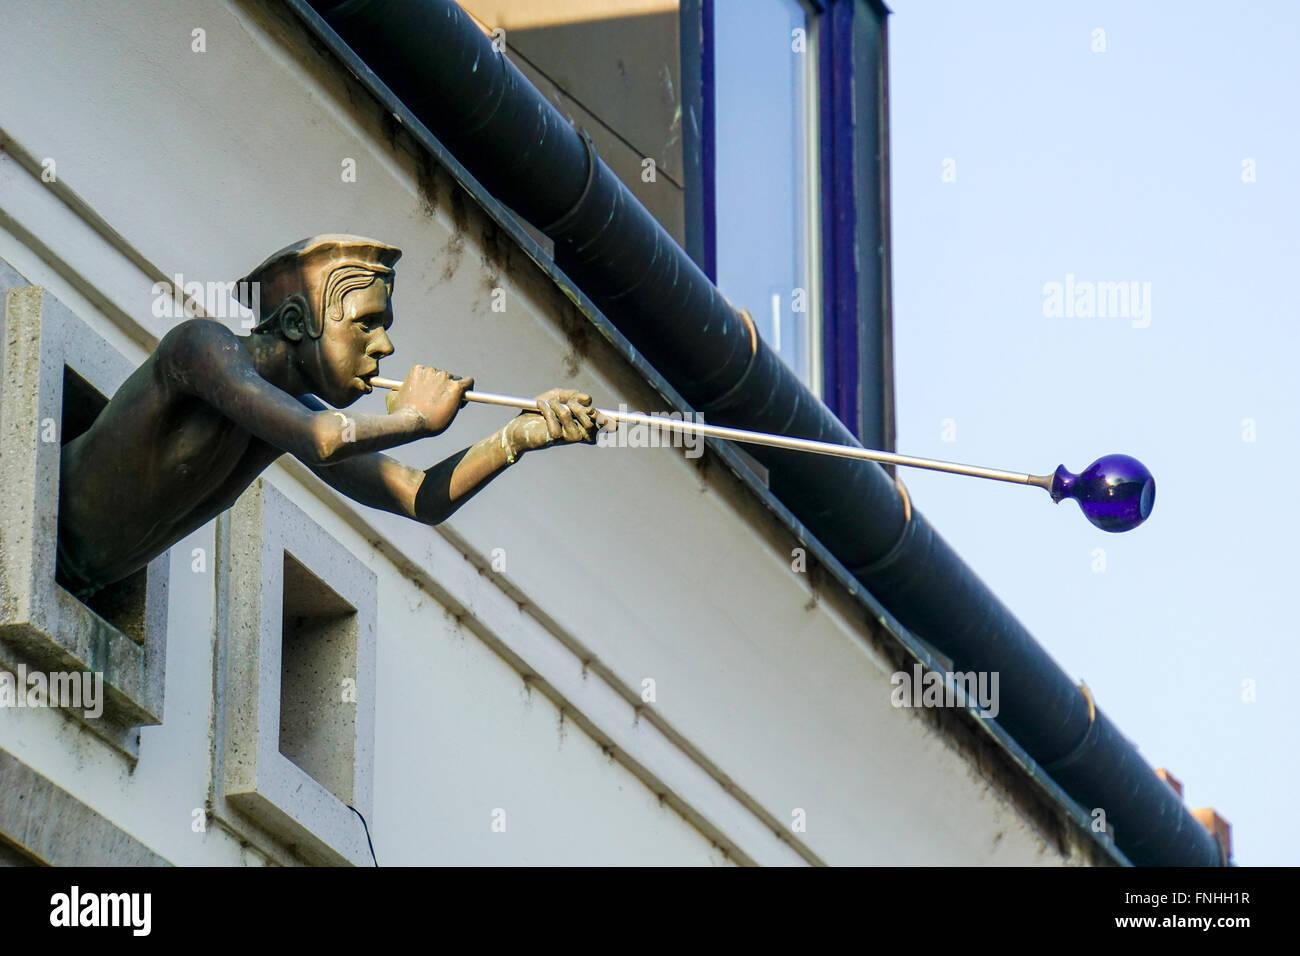 Glass blower Szentendre, Pest county, Hungary - Stock Image